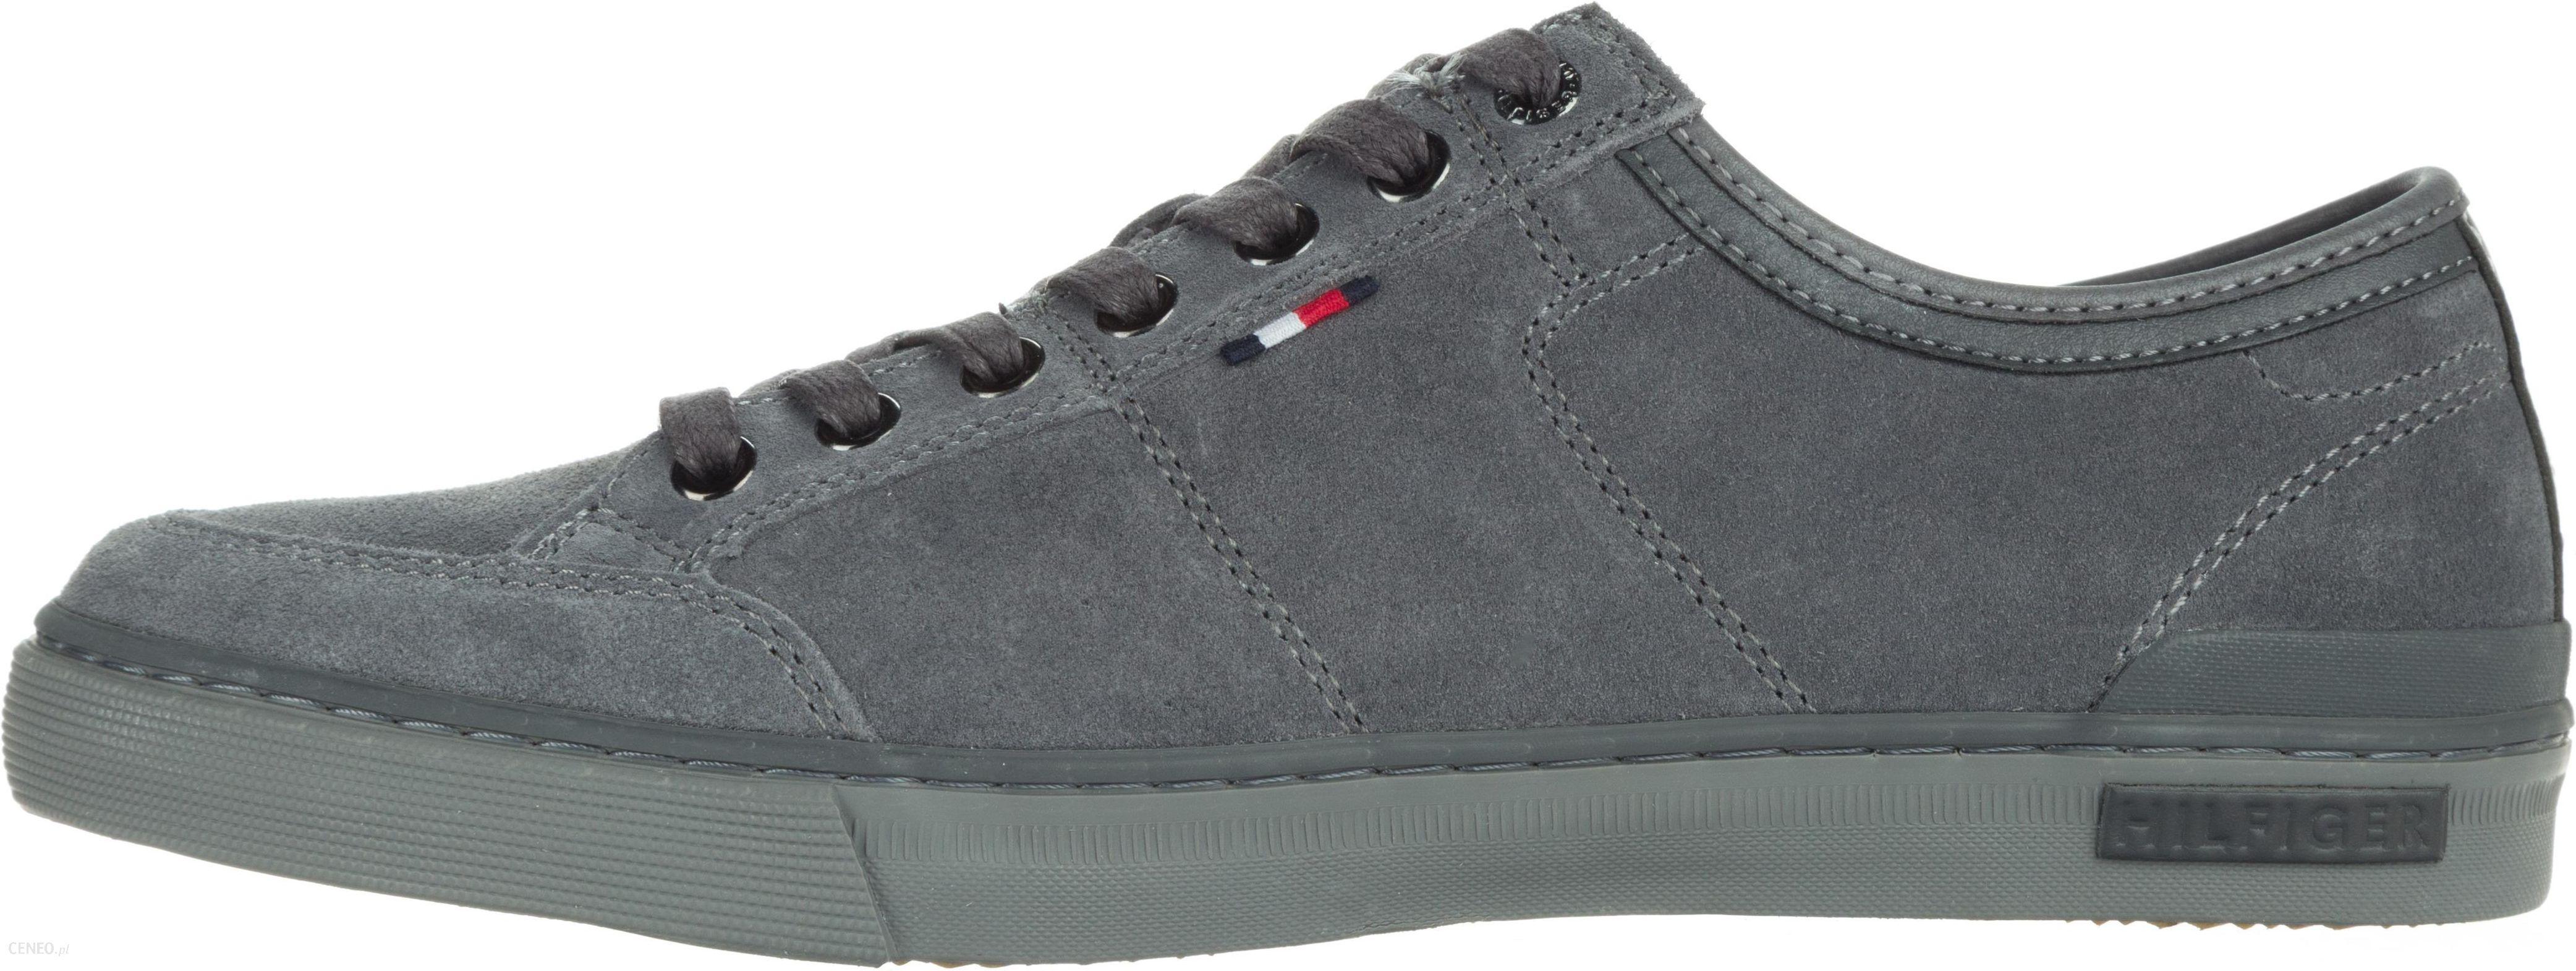 a6f0048495f56 Tommy Hilfiger Harrington 5B Sneakers Szary 41 - Ceny i opinie ...